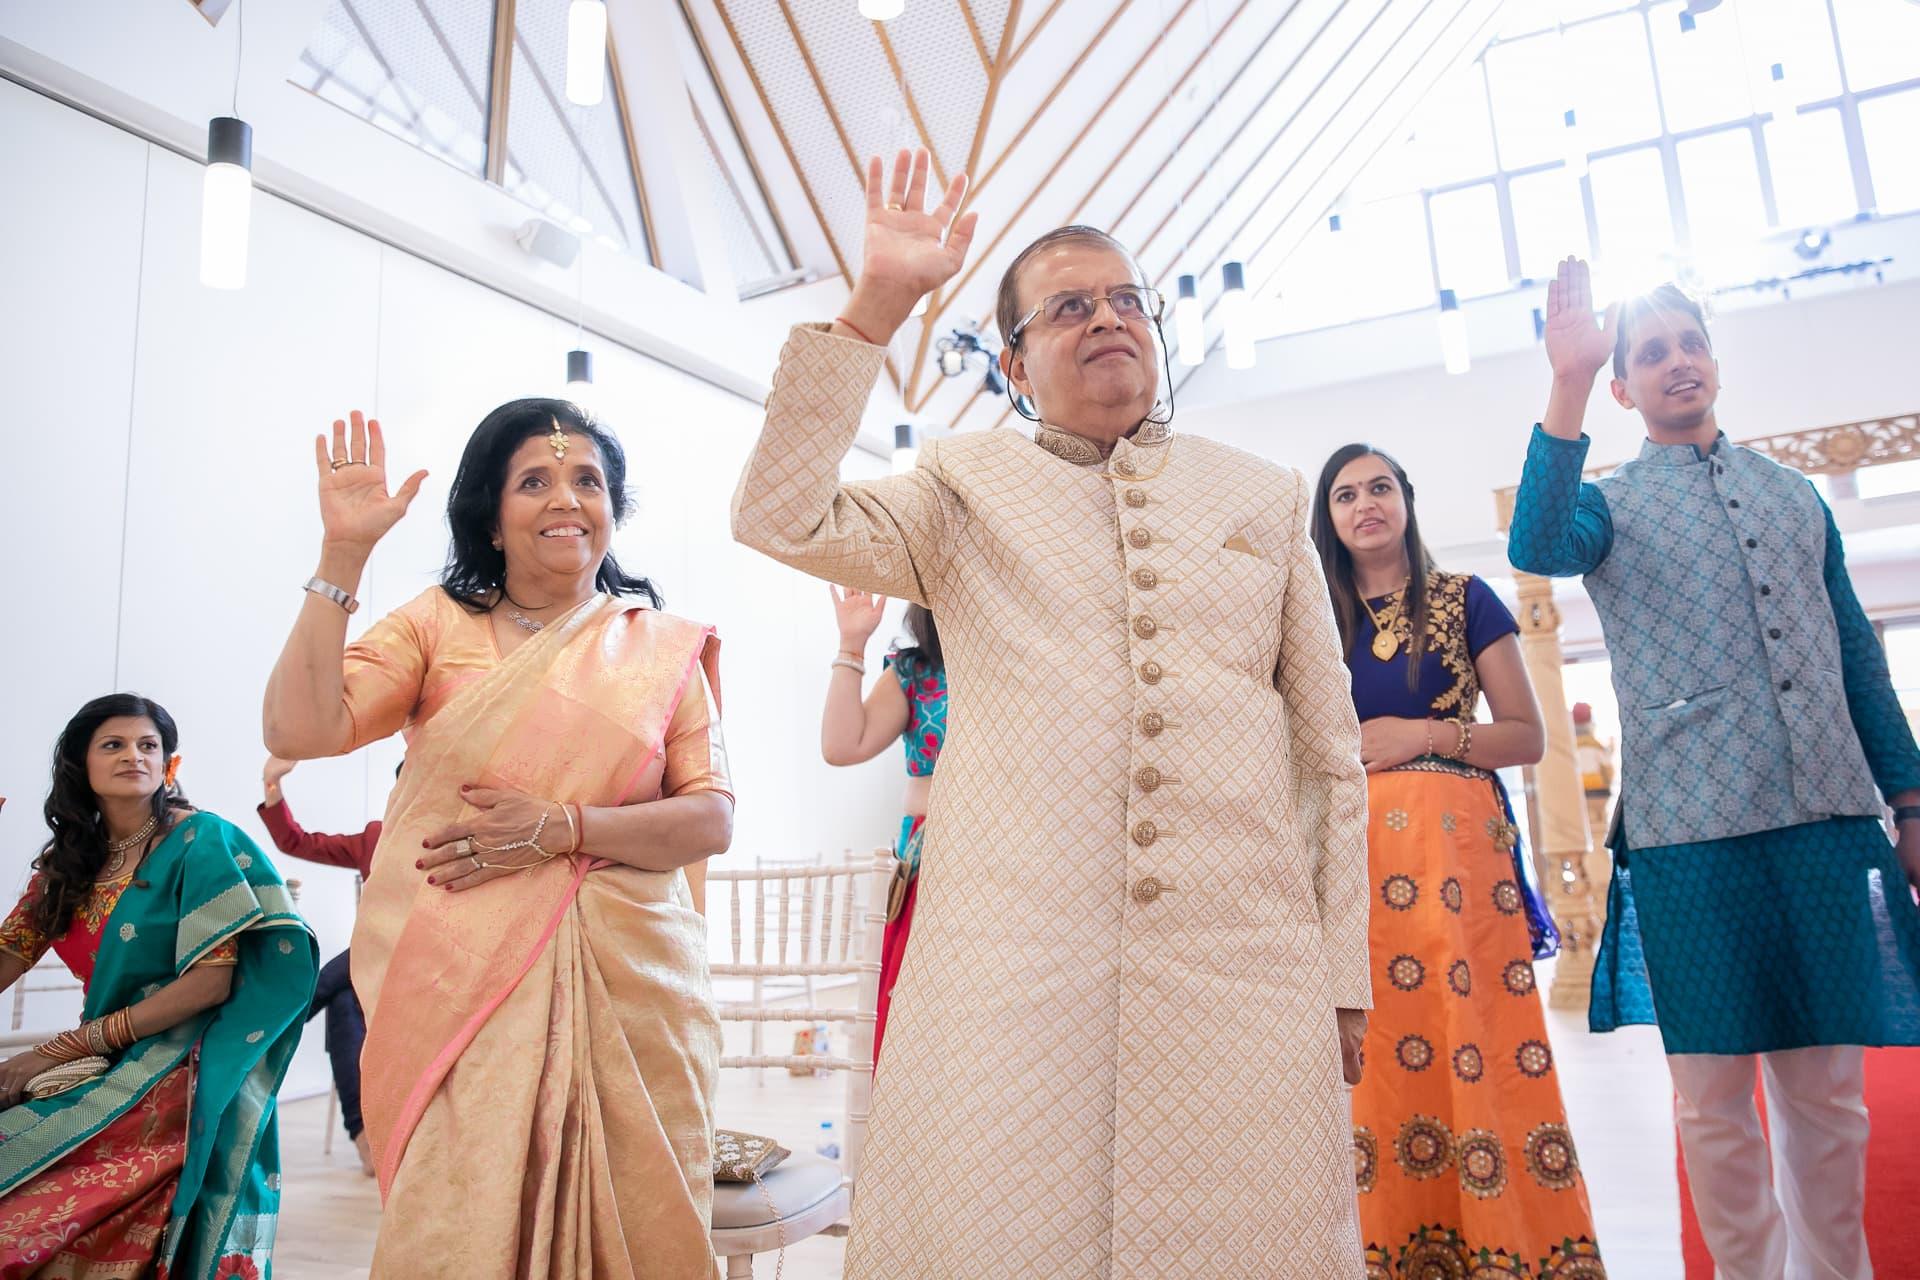 Family members celebrating the wedding